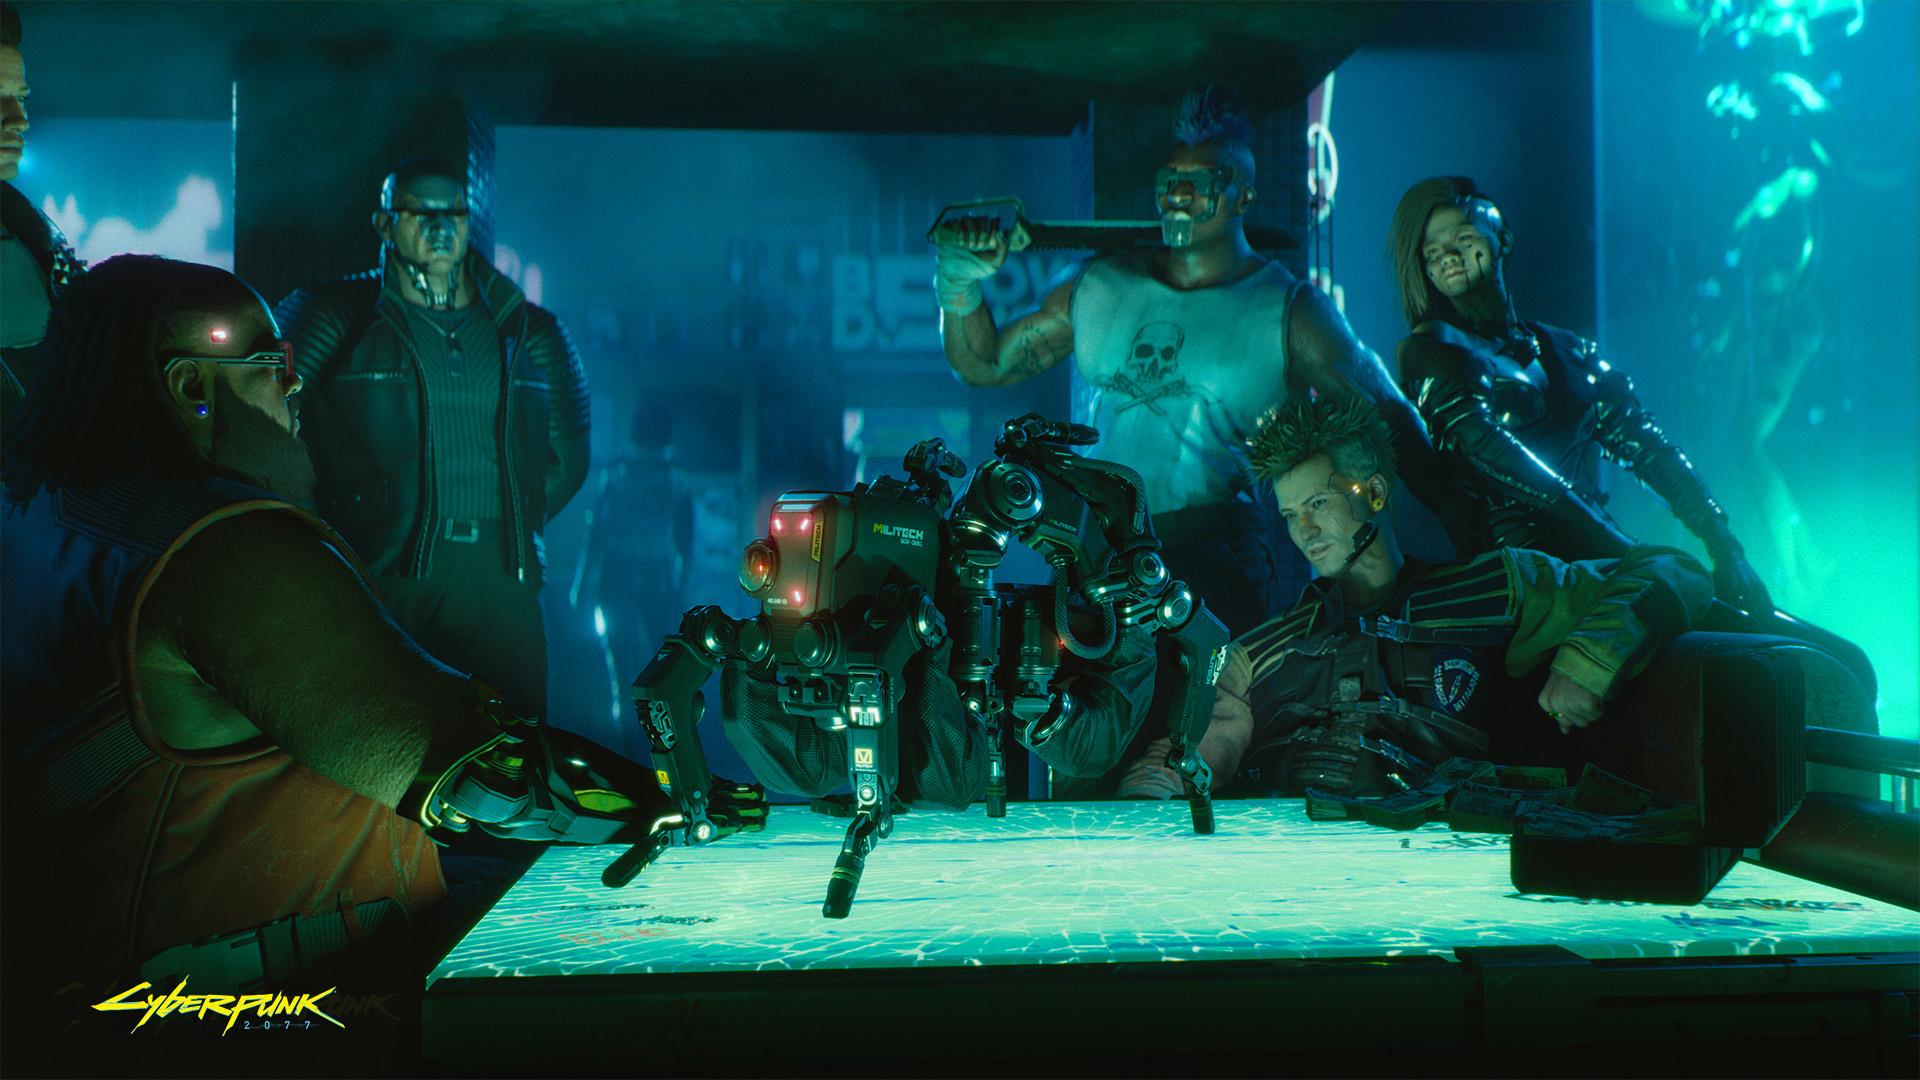 Cyberpunk 2077 wallpaper It's a deal